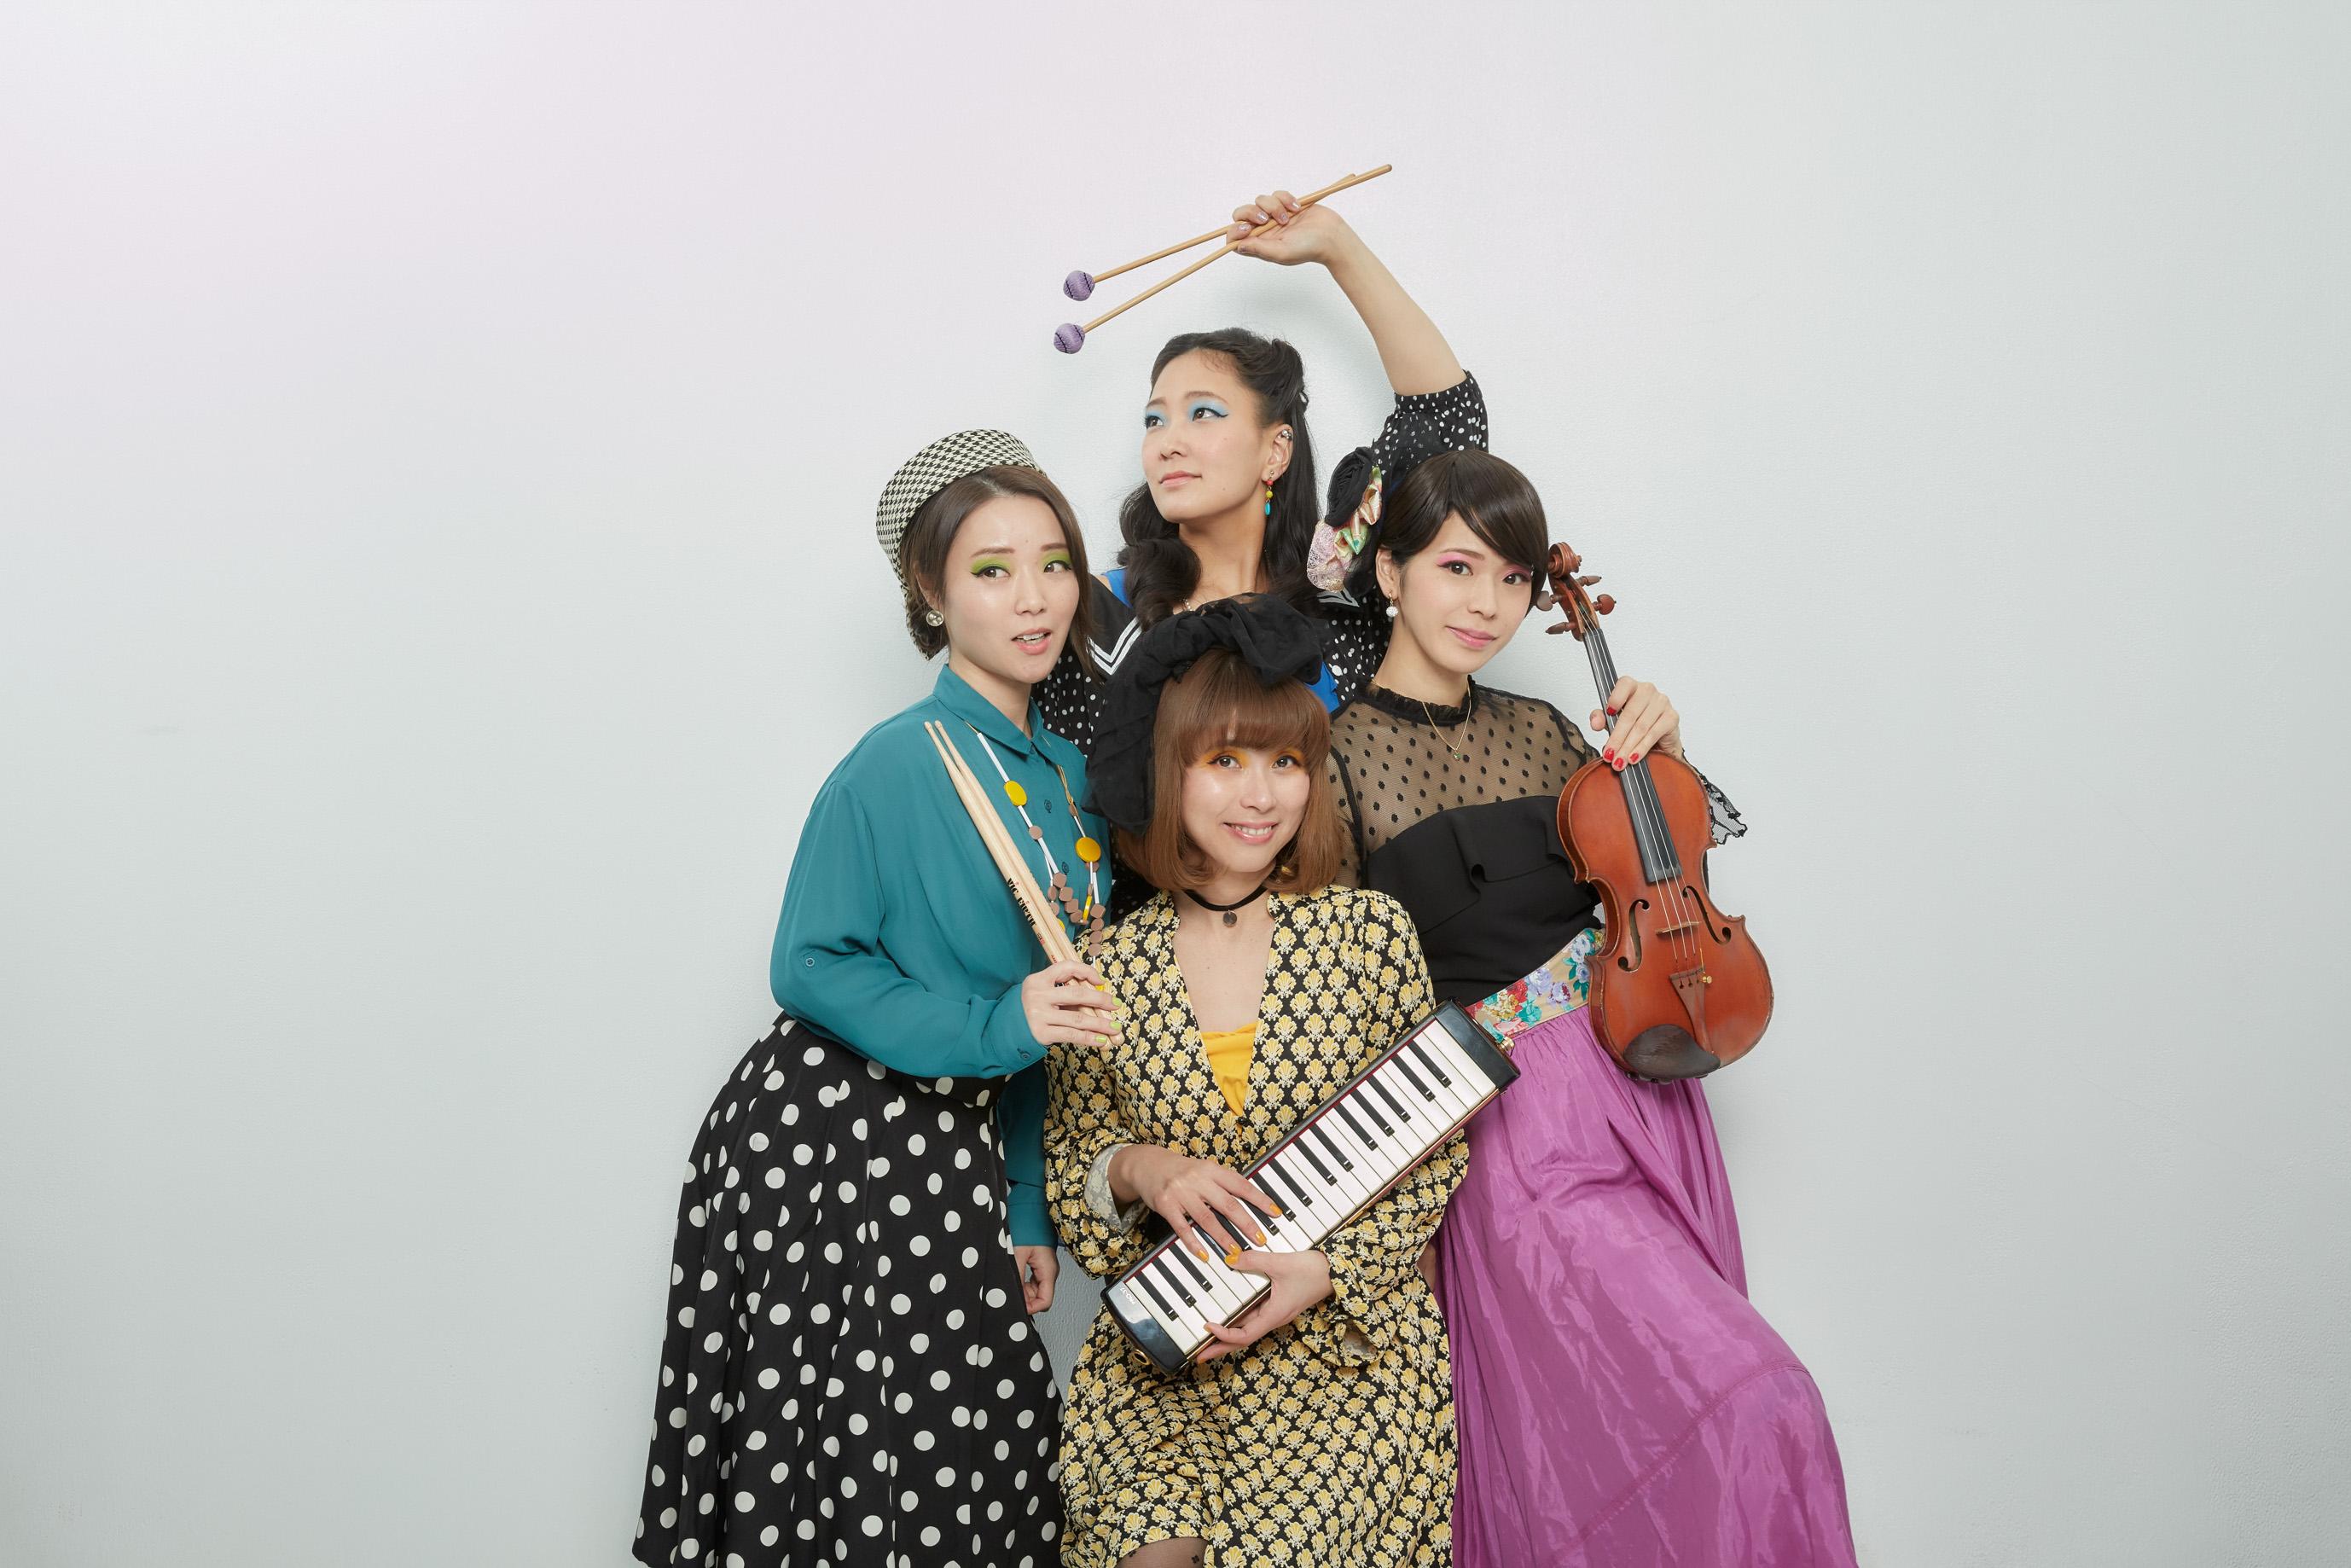 『i's-アイス-2nd Album リリースLIVEツアー』